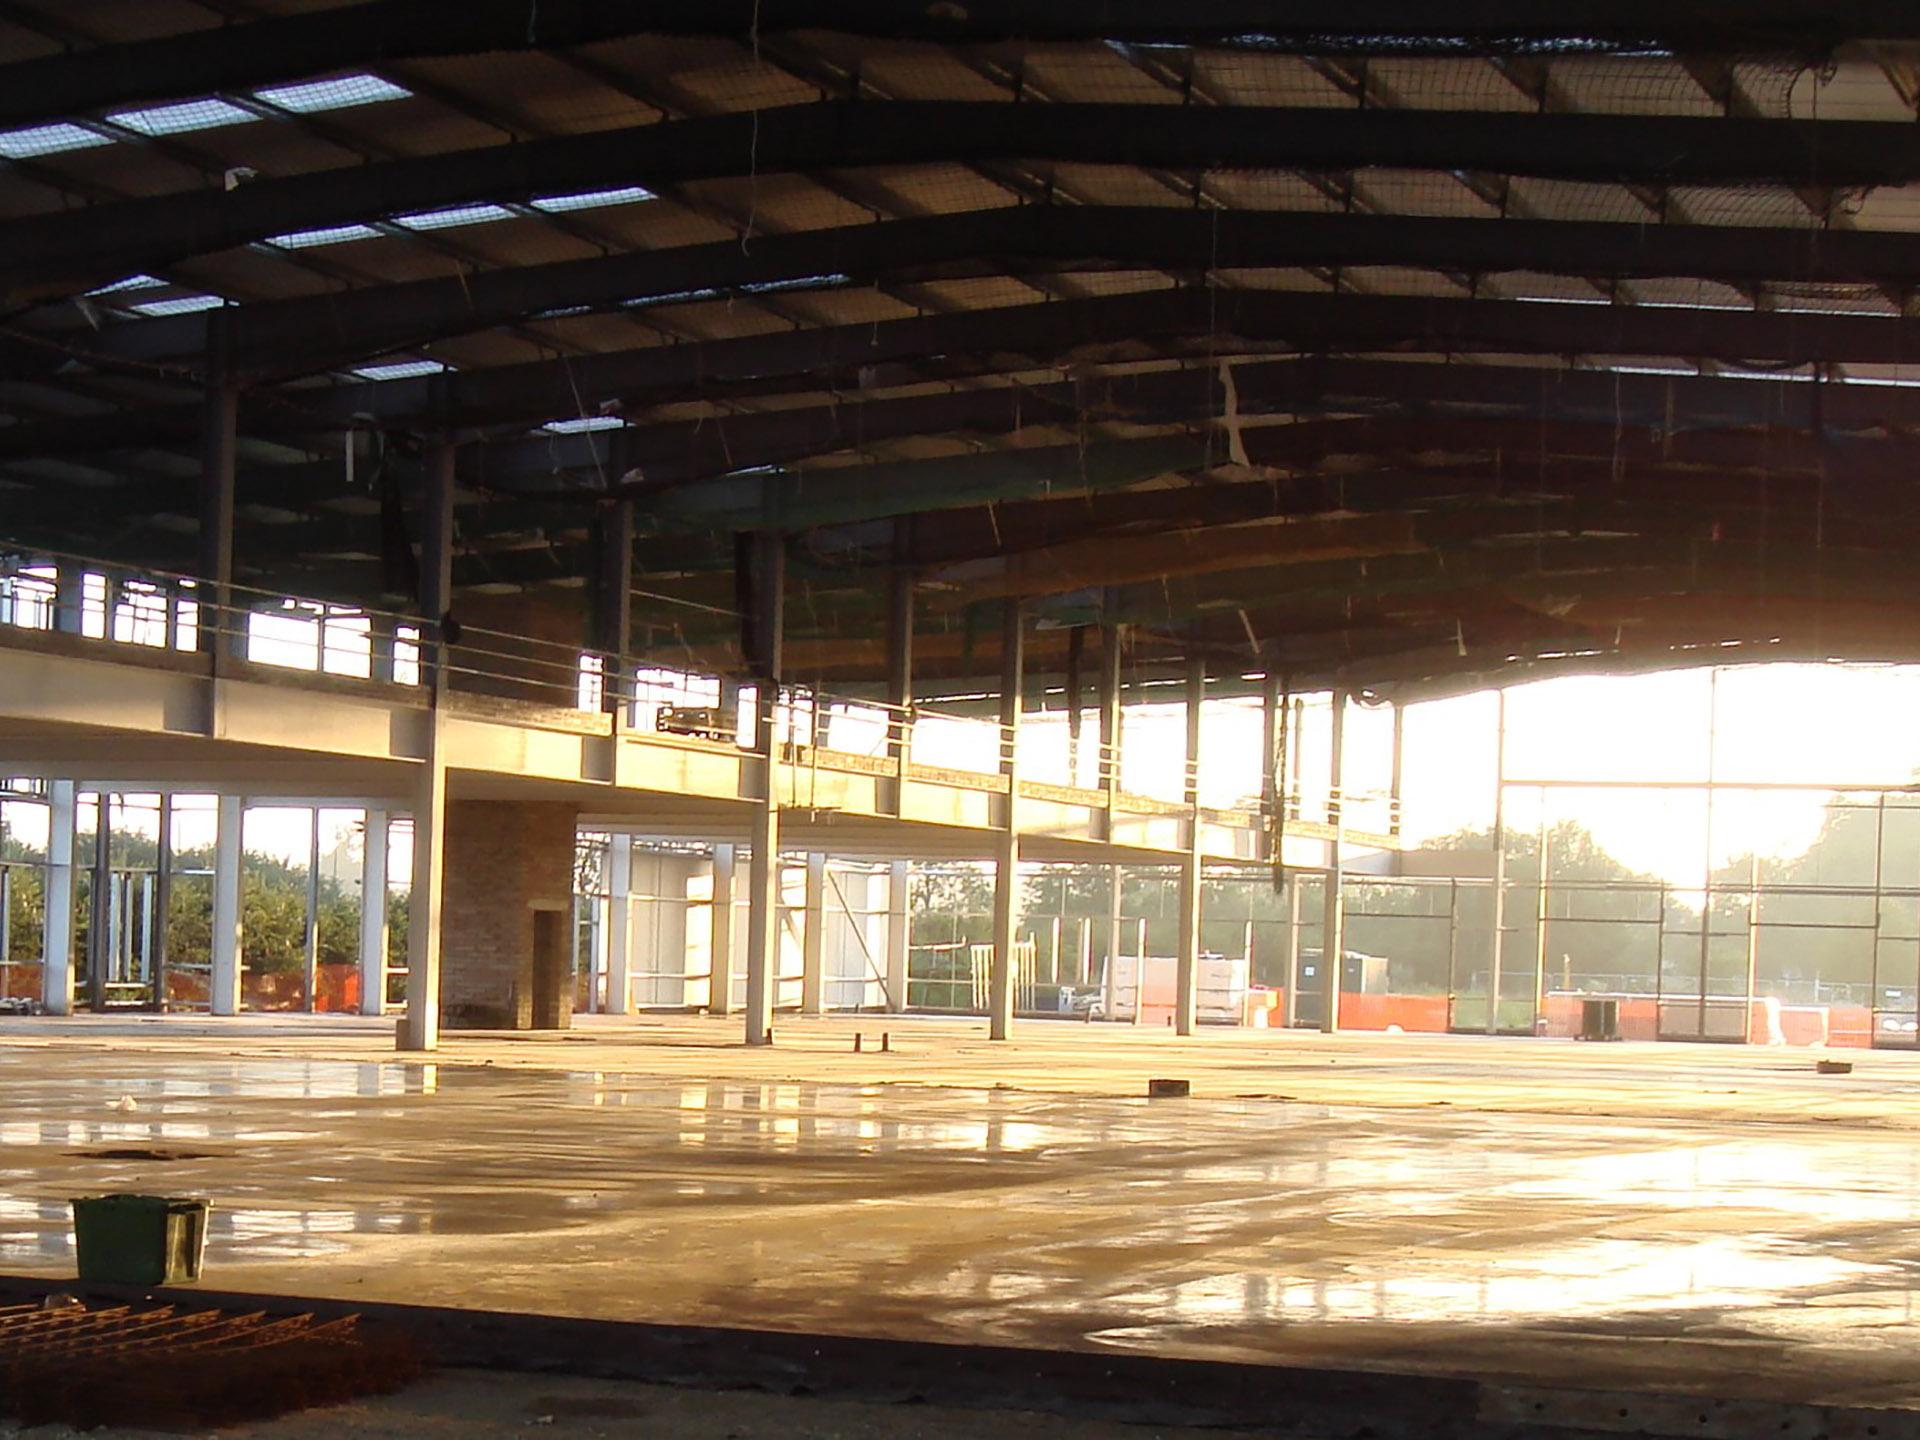 Concrete floor drying in warehouse